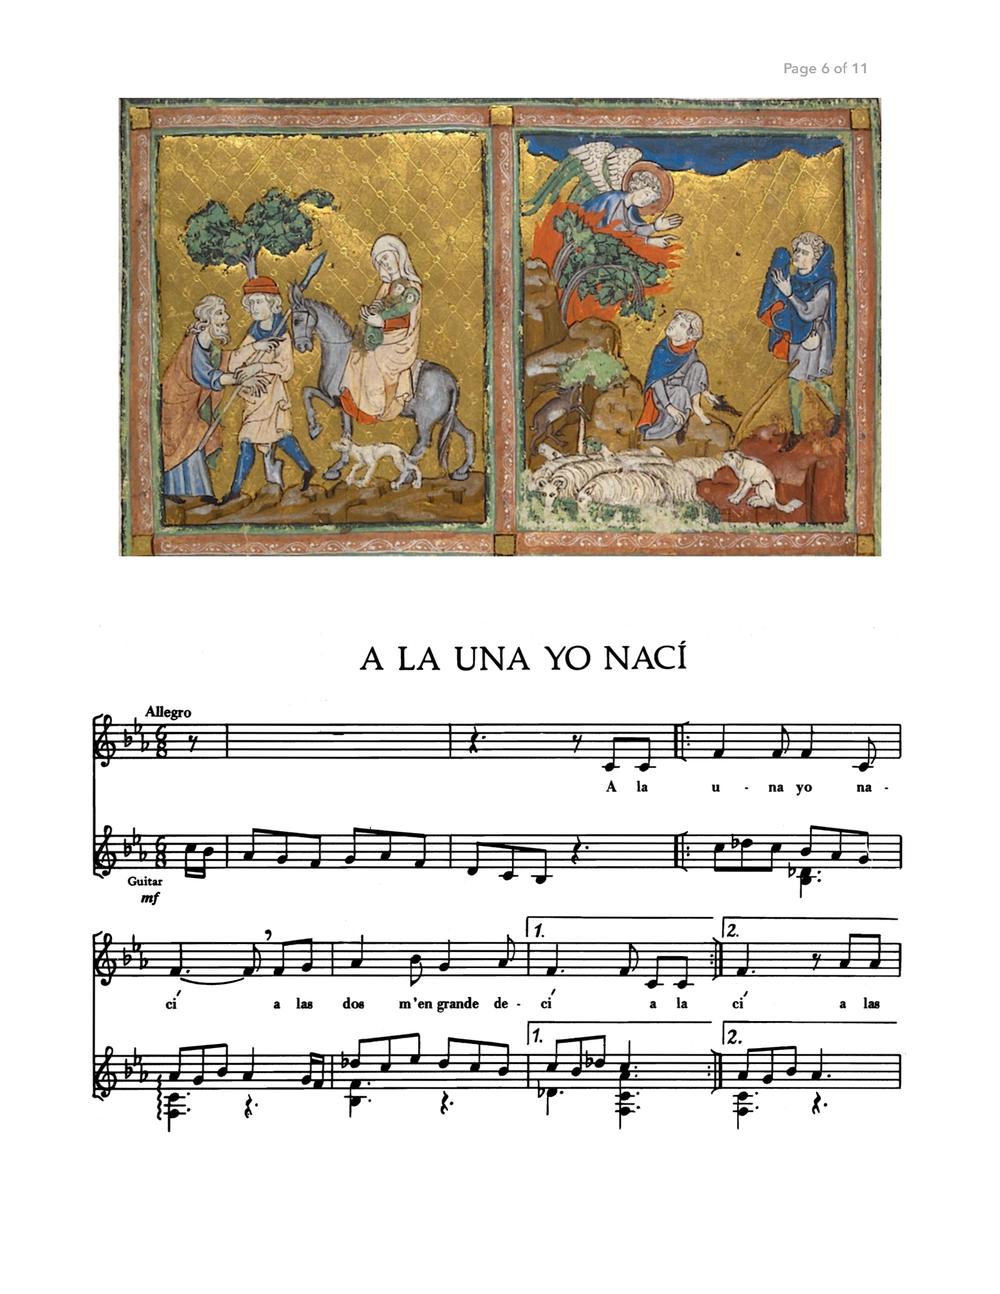 Ladino_Sephardic Music_Page_06.png